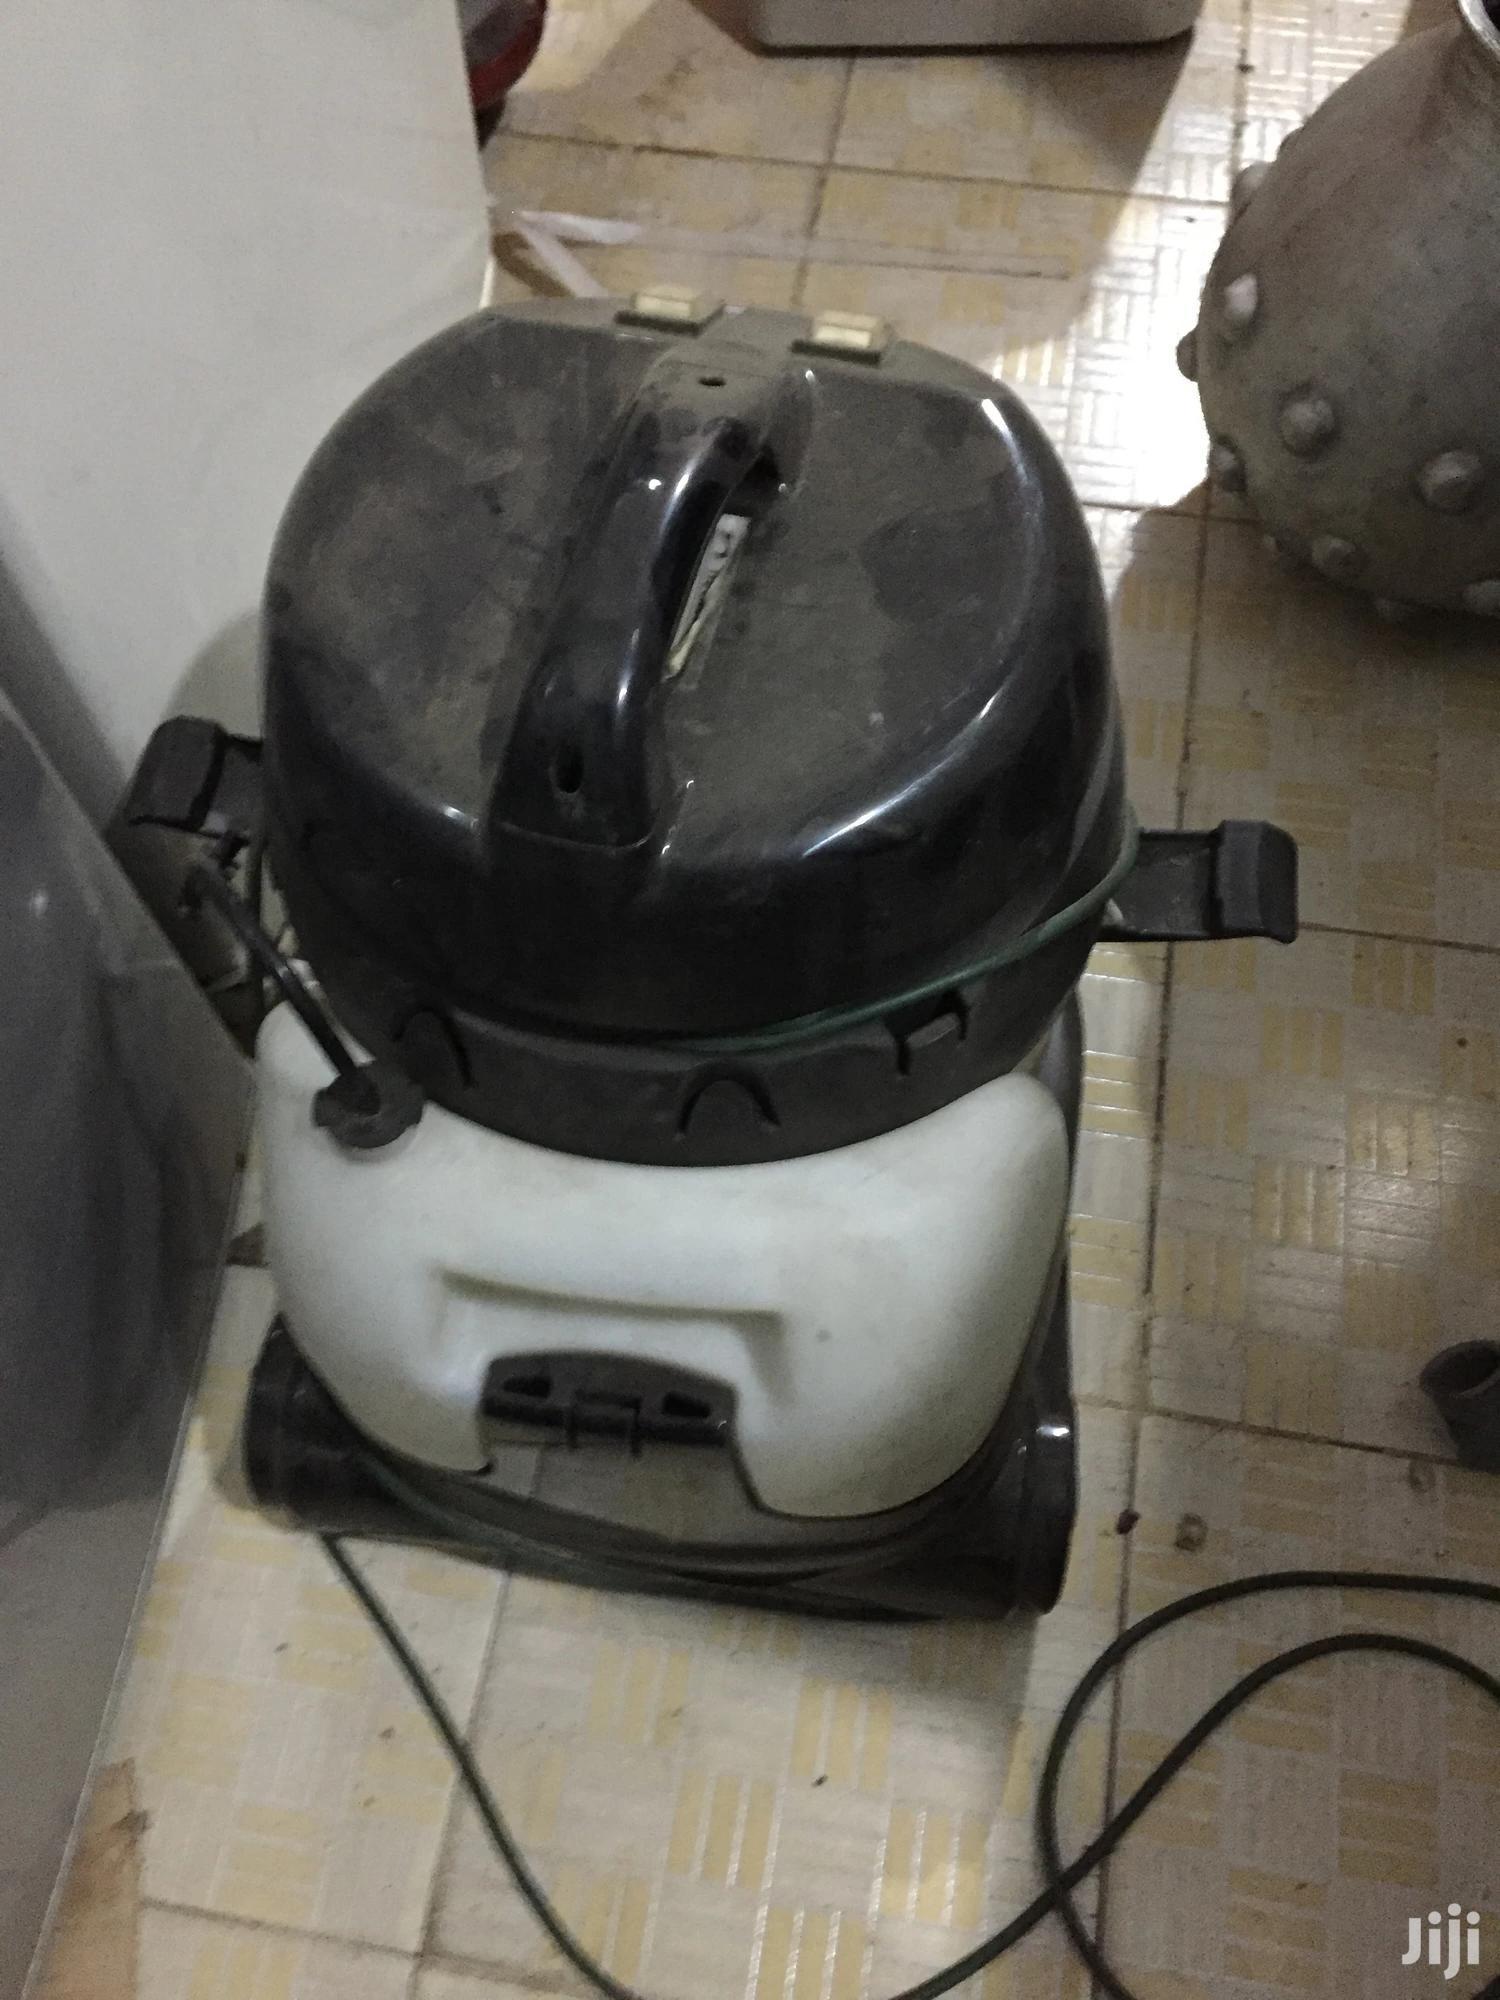 Lloyds Wet & Dry Vacuum Cleaner | Home Appliances for sale in Nairobi Central, Nairobi, Kenya